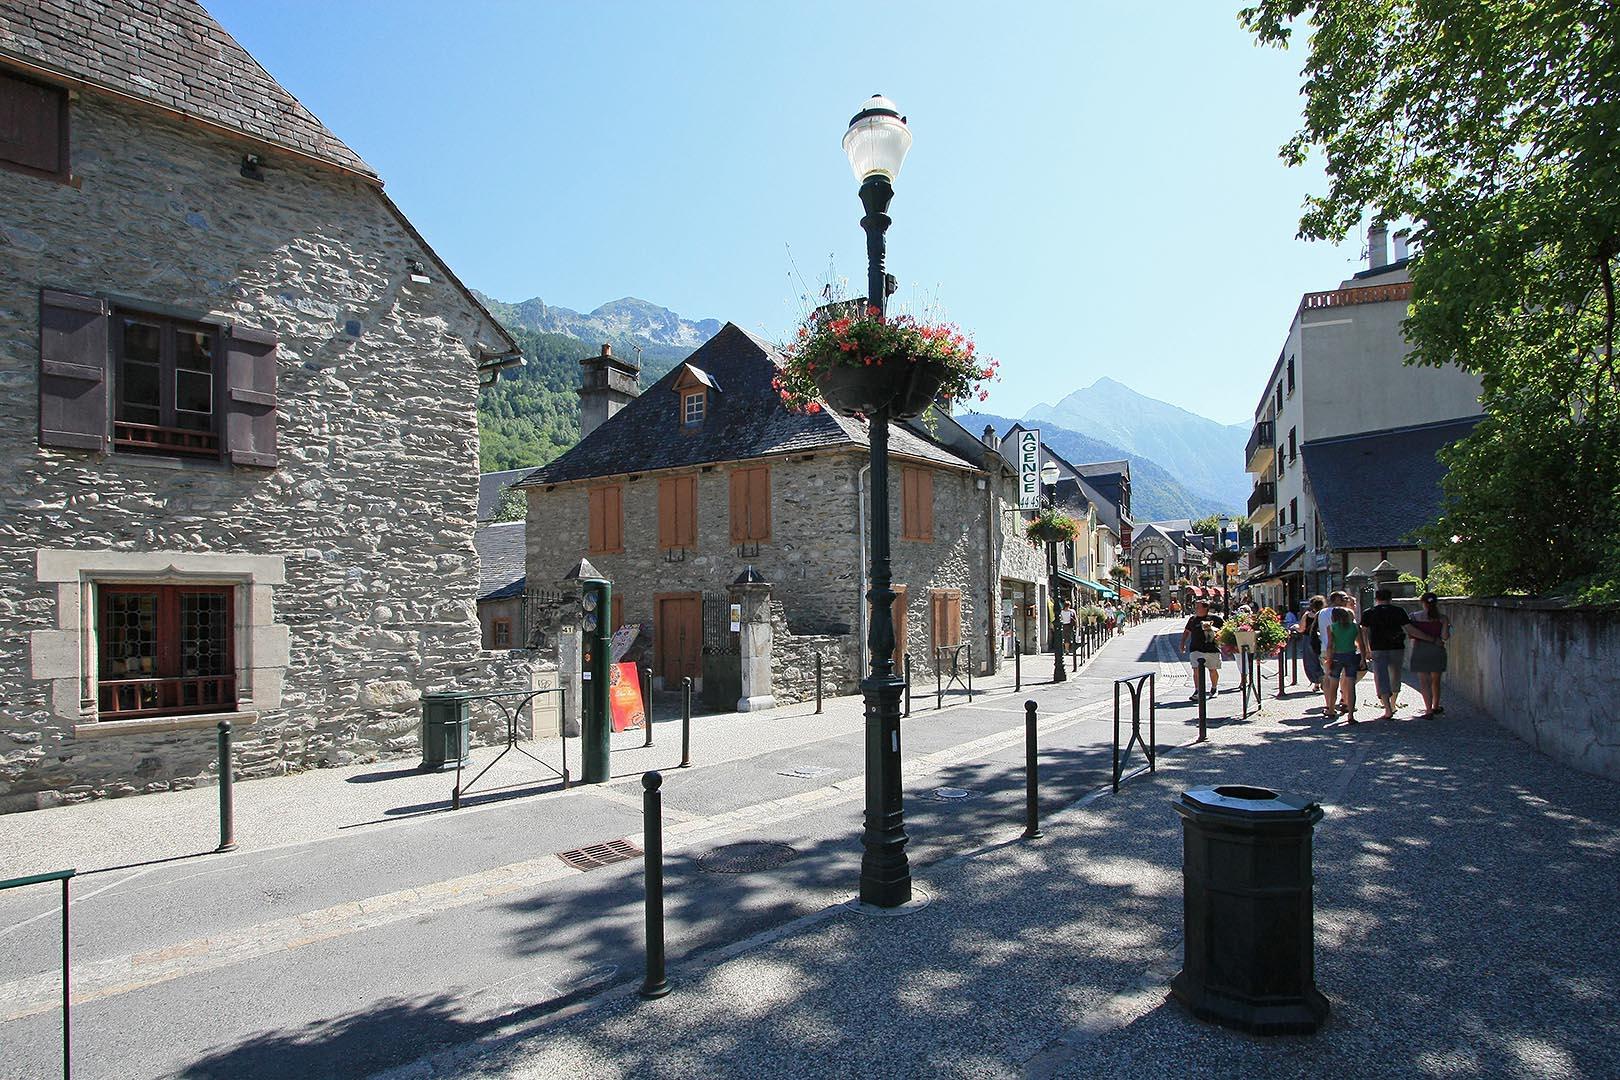 Saint-Lary-Soulan France  city photos gallery : Saint Lary Soulan